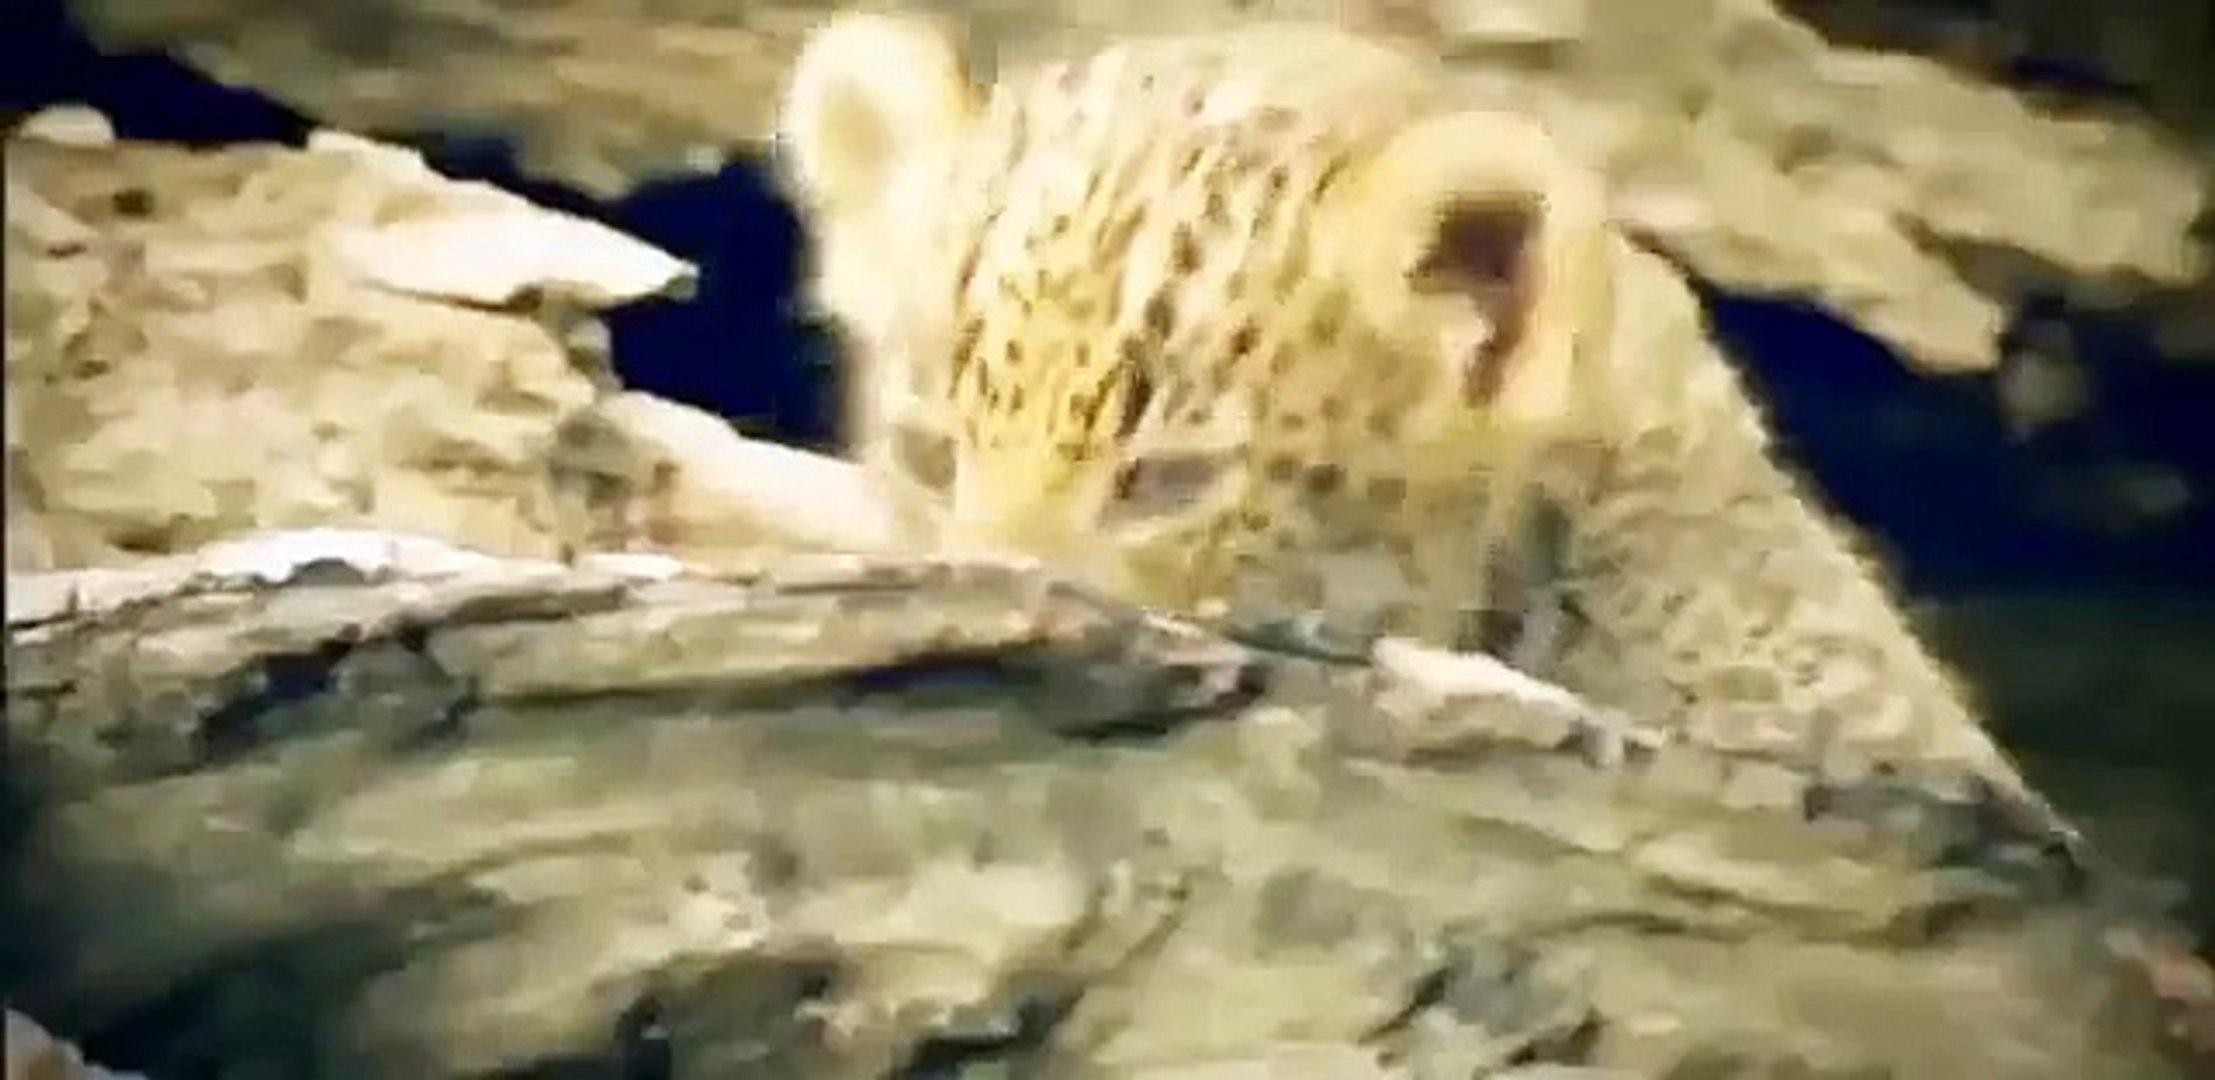 Discovery Animals - Animals Planet 2015 - Wild Kalahari